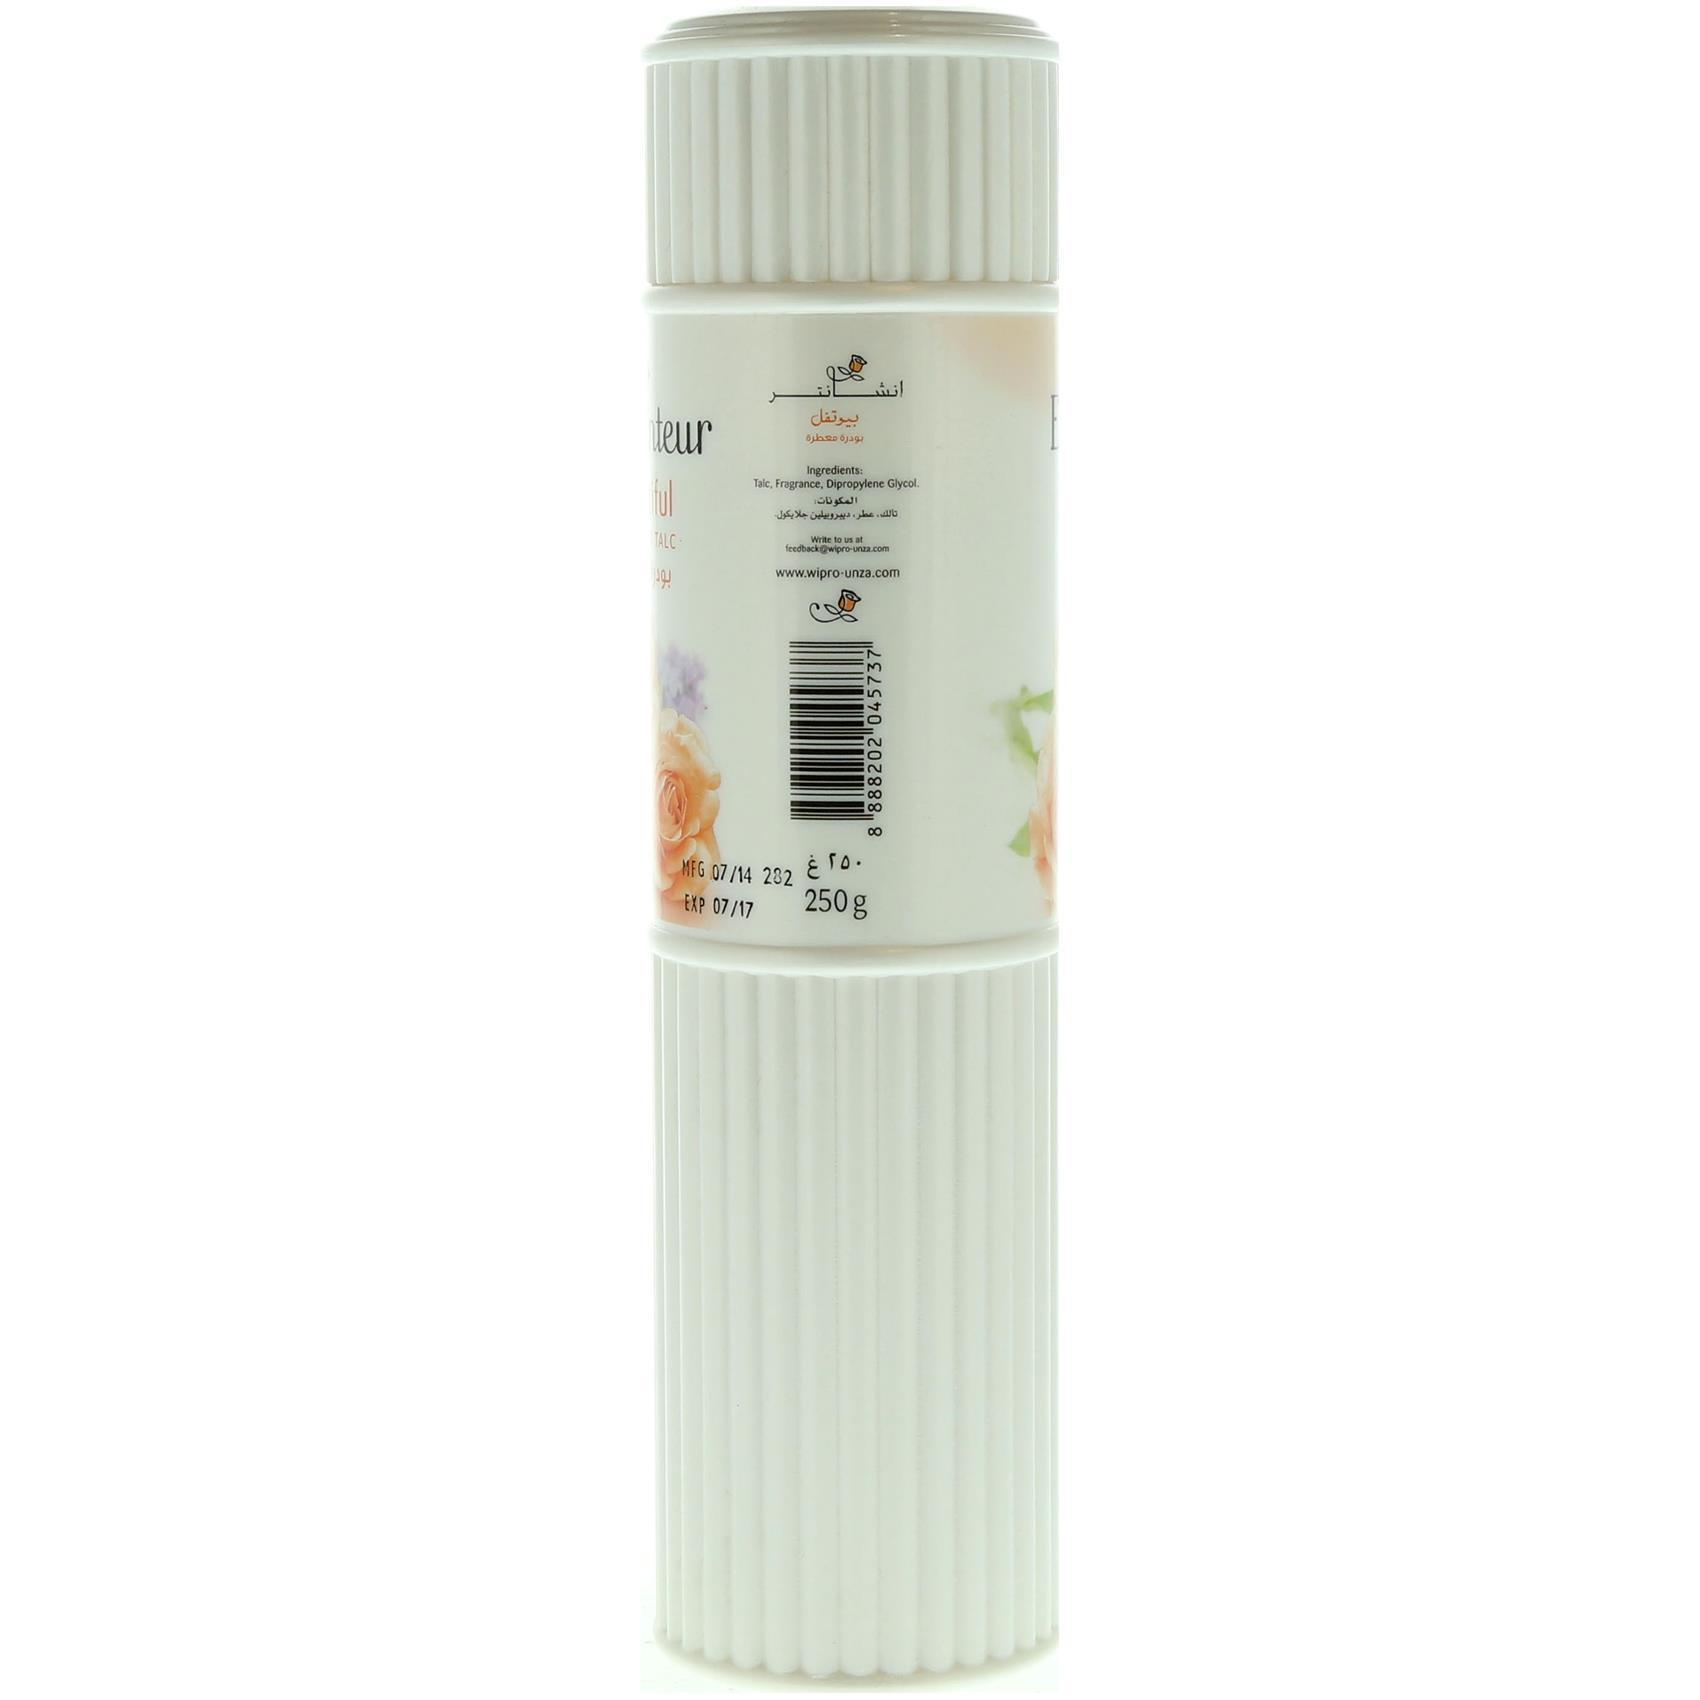 ENCHANTEUR PERFUME TALC DESIRE 250G